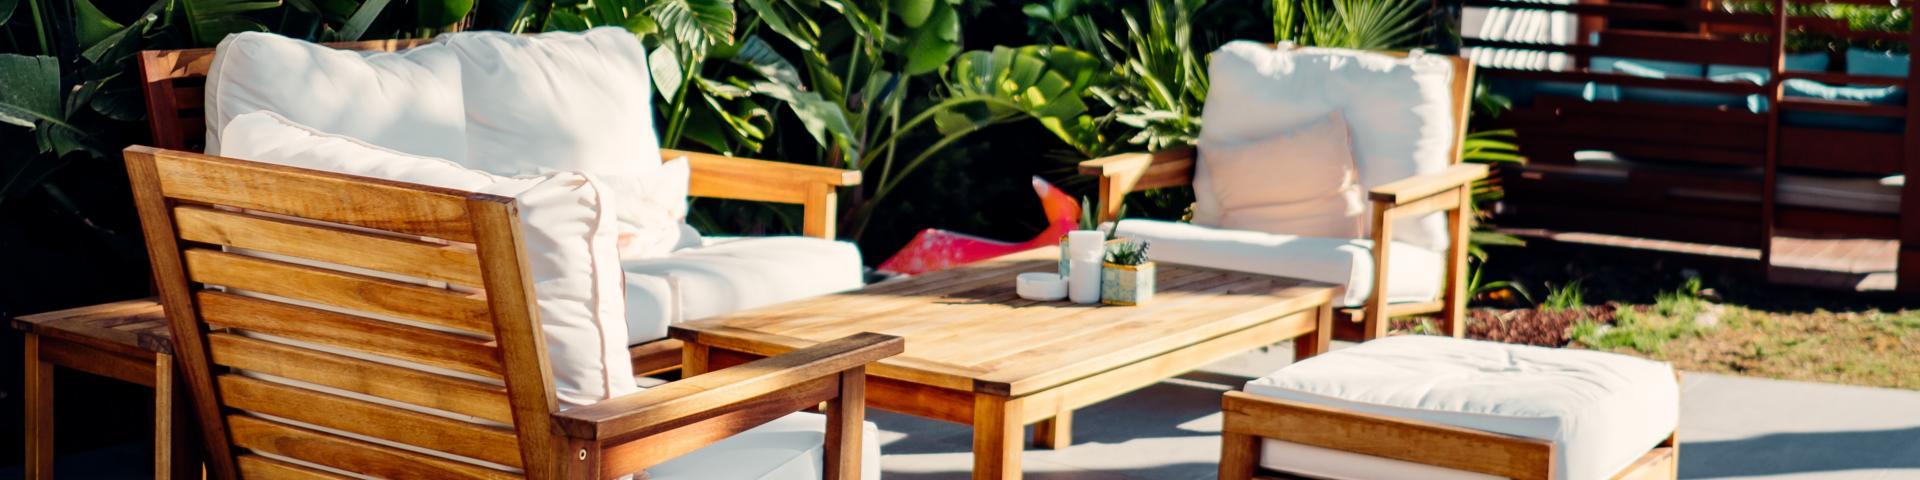 The European market potential for garden furniture   CBI